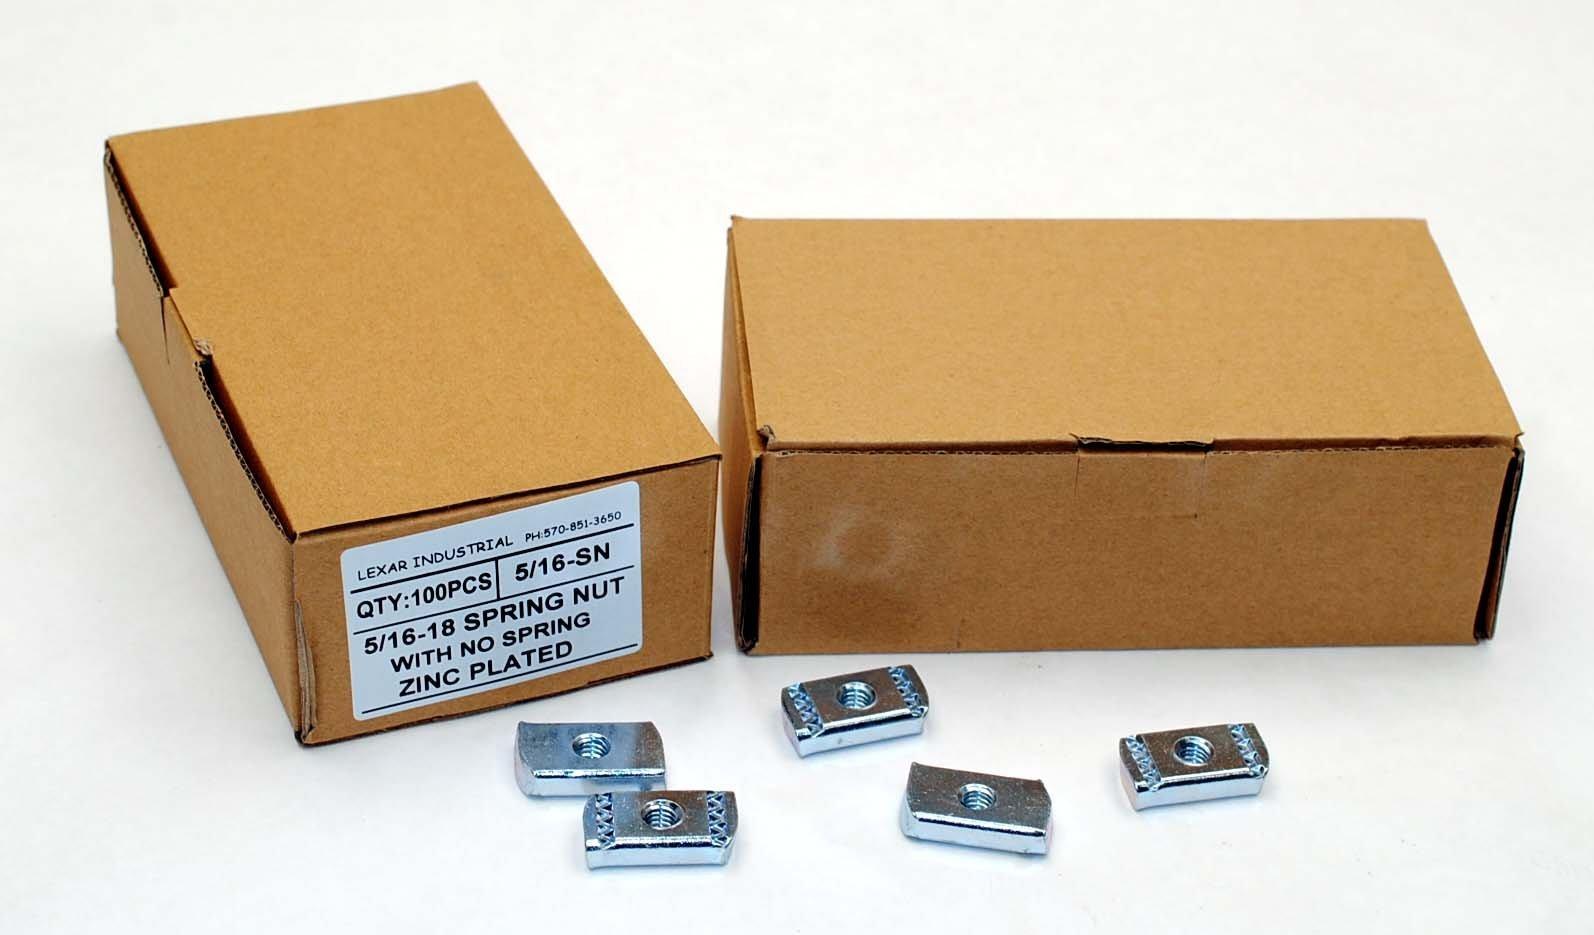 (100) Strut Channel Nuts 5/16-18 No Spring Zinc Plated Unistrut Nut by Lexar Industrial